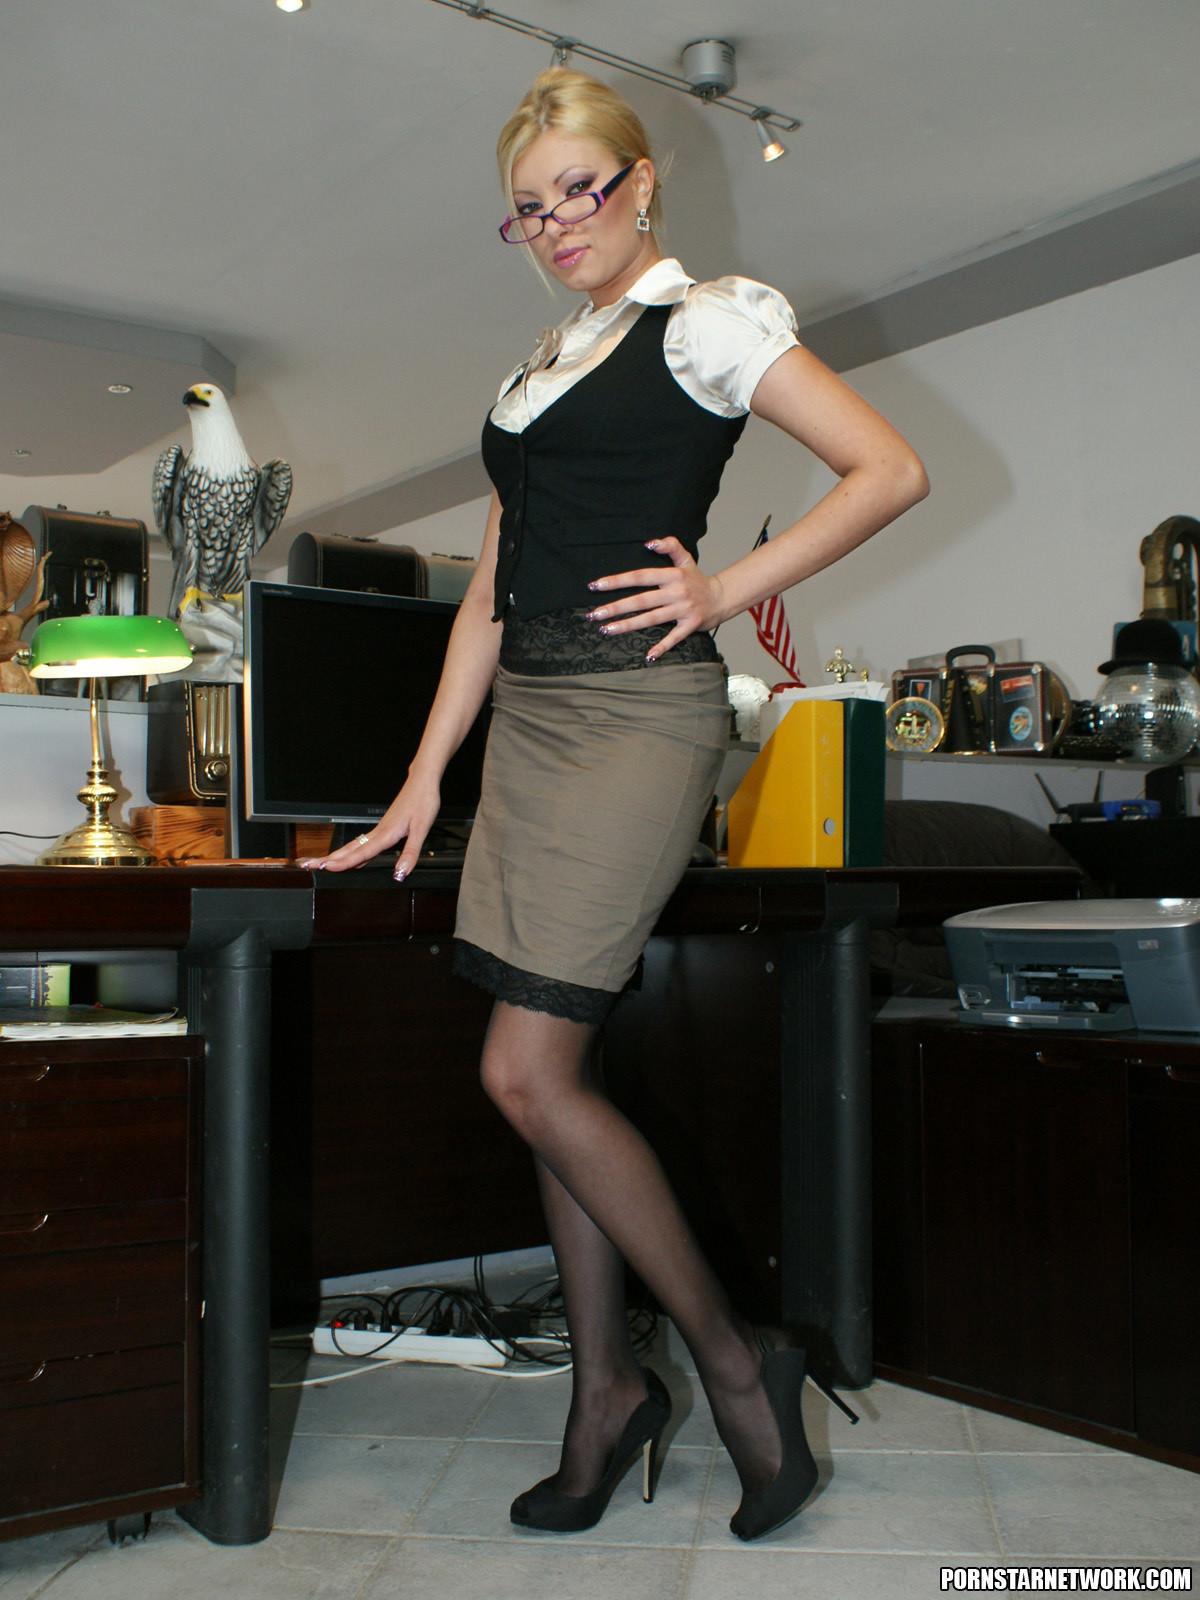 Секретарша без чулков 20 фотография